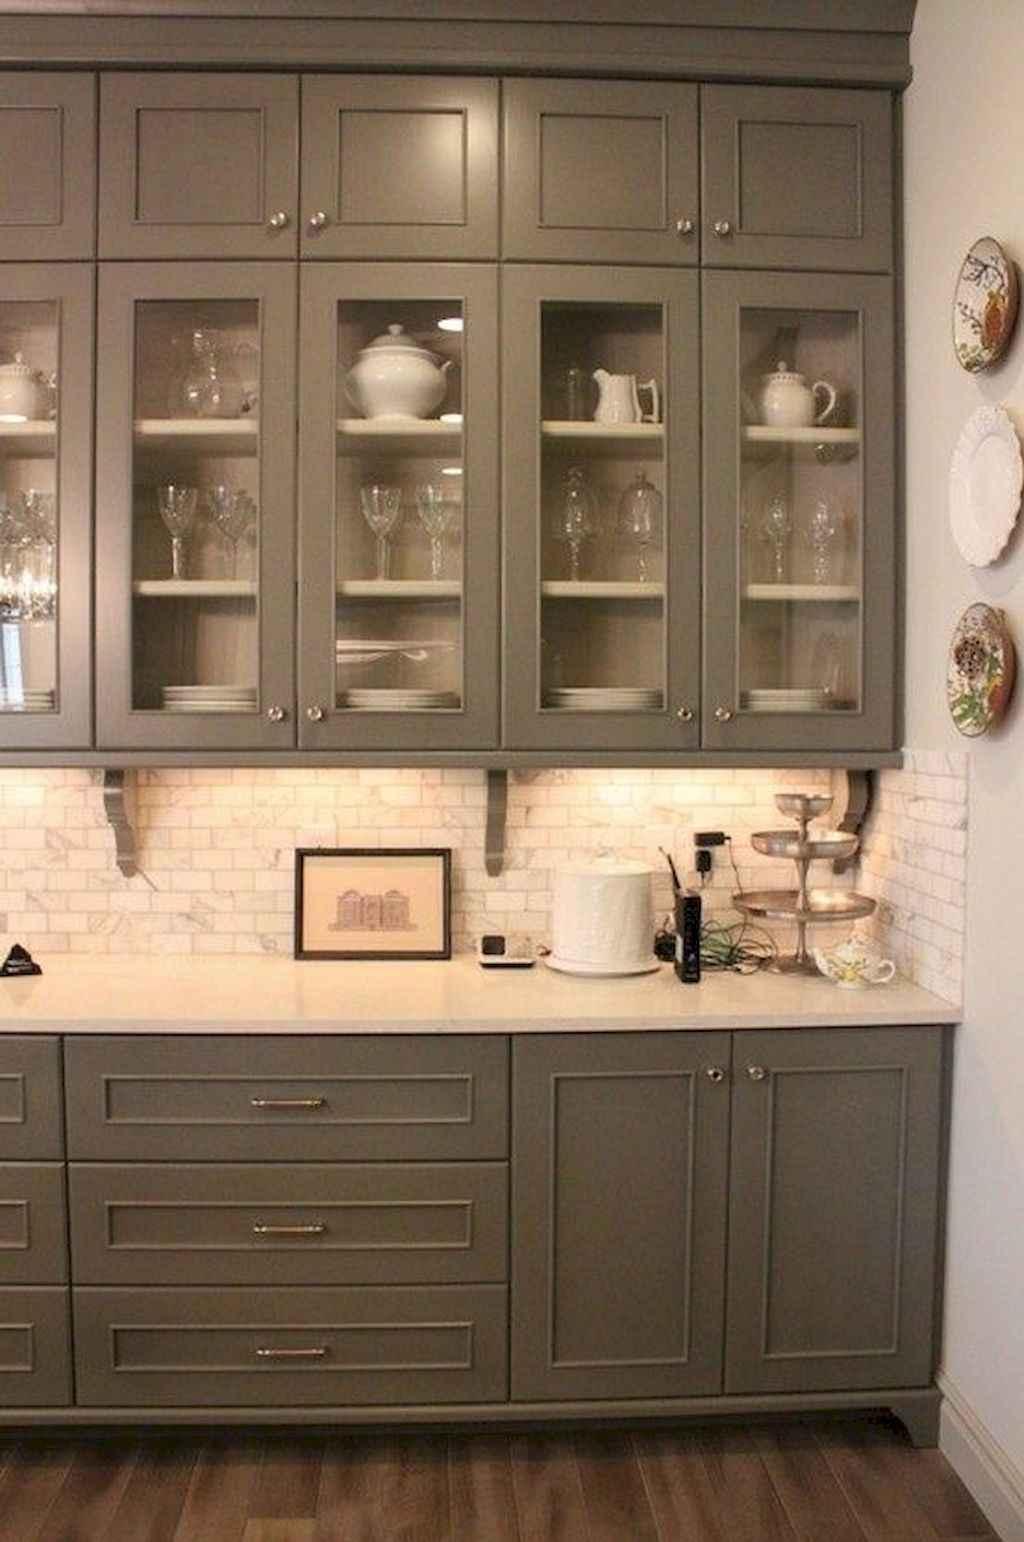 Gorgeous gray kitchen cabinet makeover ideas (40)